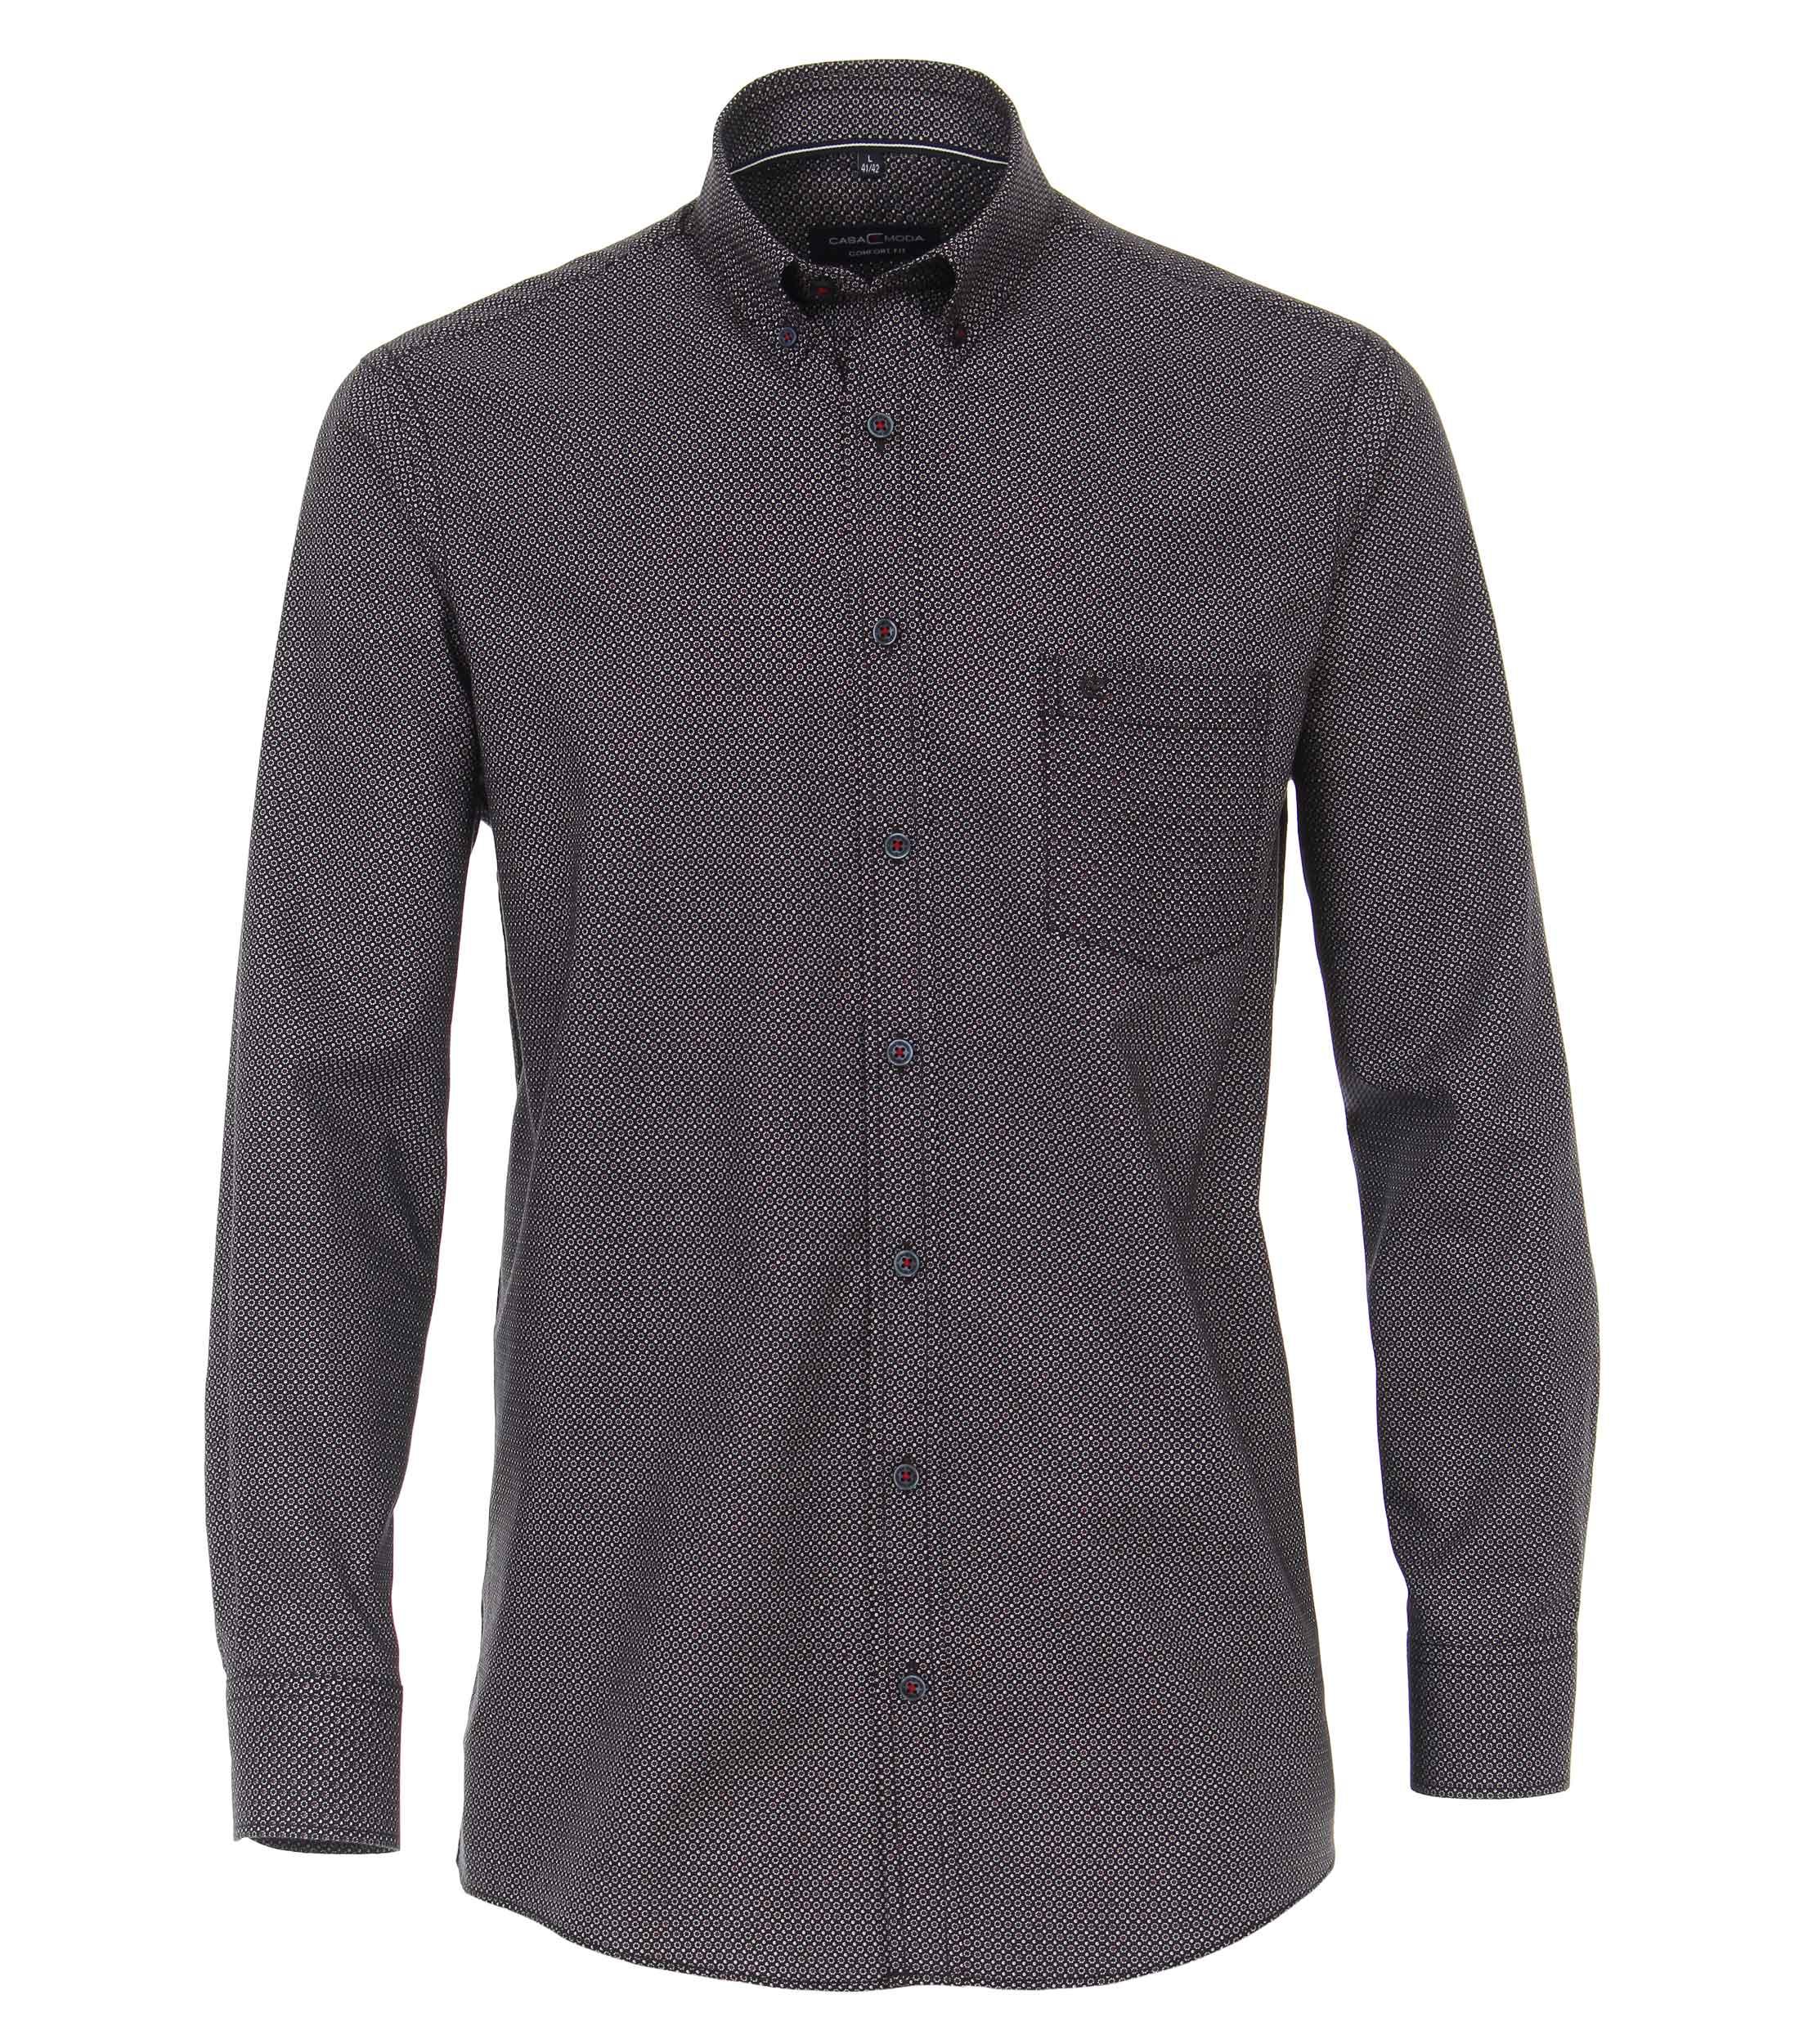 CasaModa Baumwollhemd gemustert grau